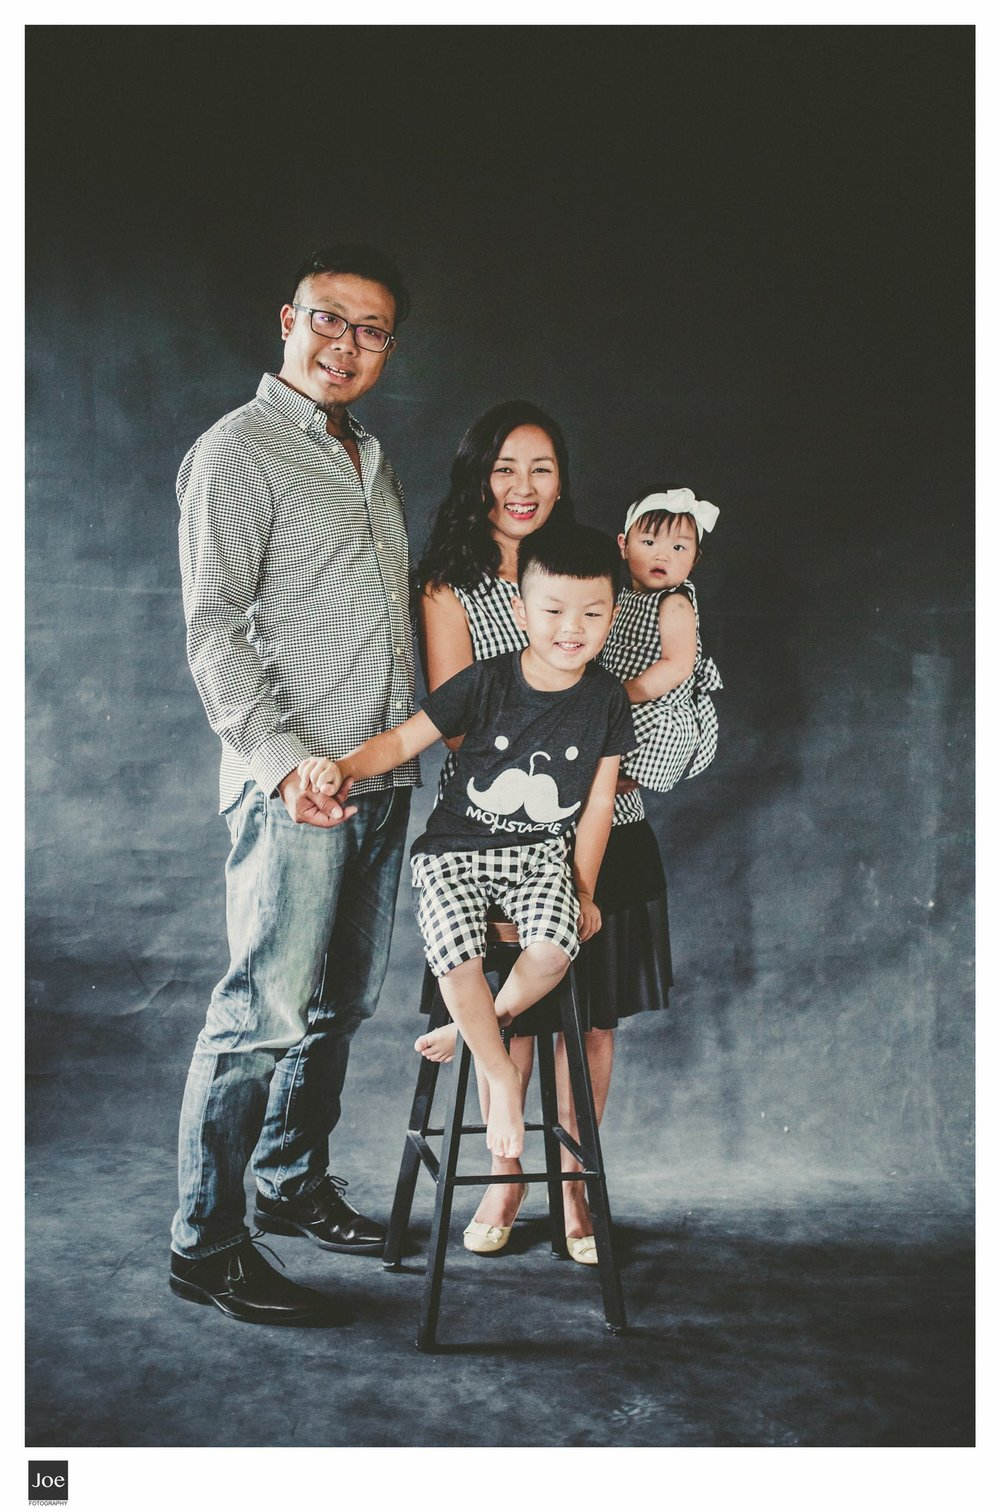 joe-fotography-family-photo-pepper-salt-bowtie-005.jpg